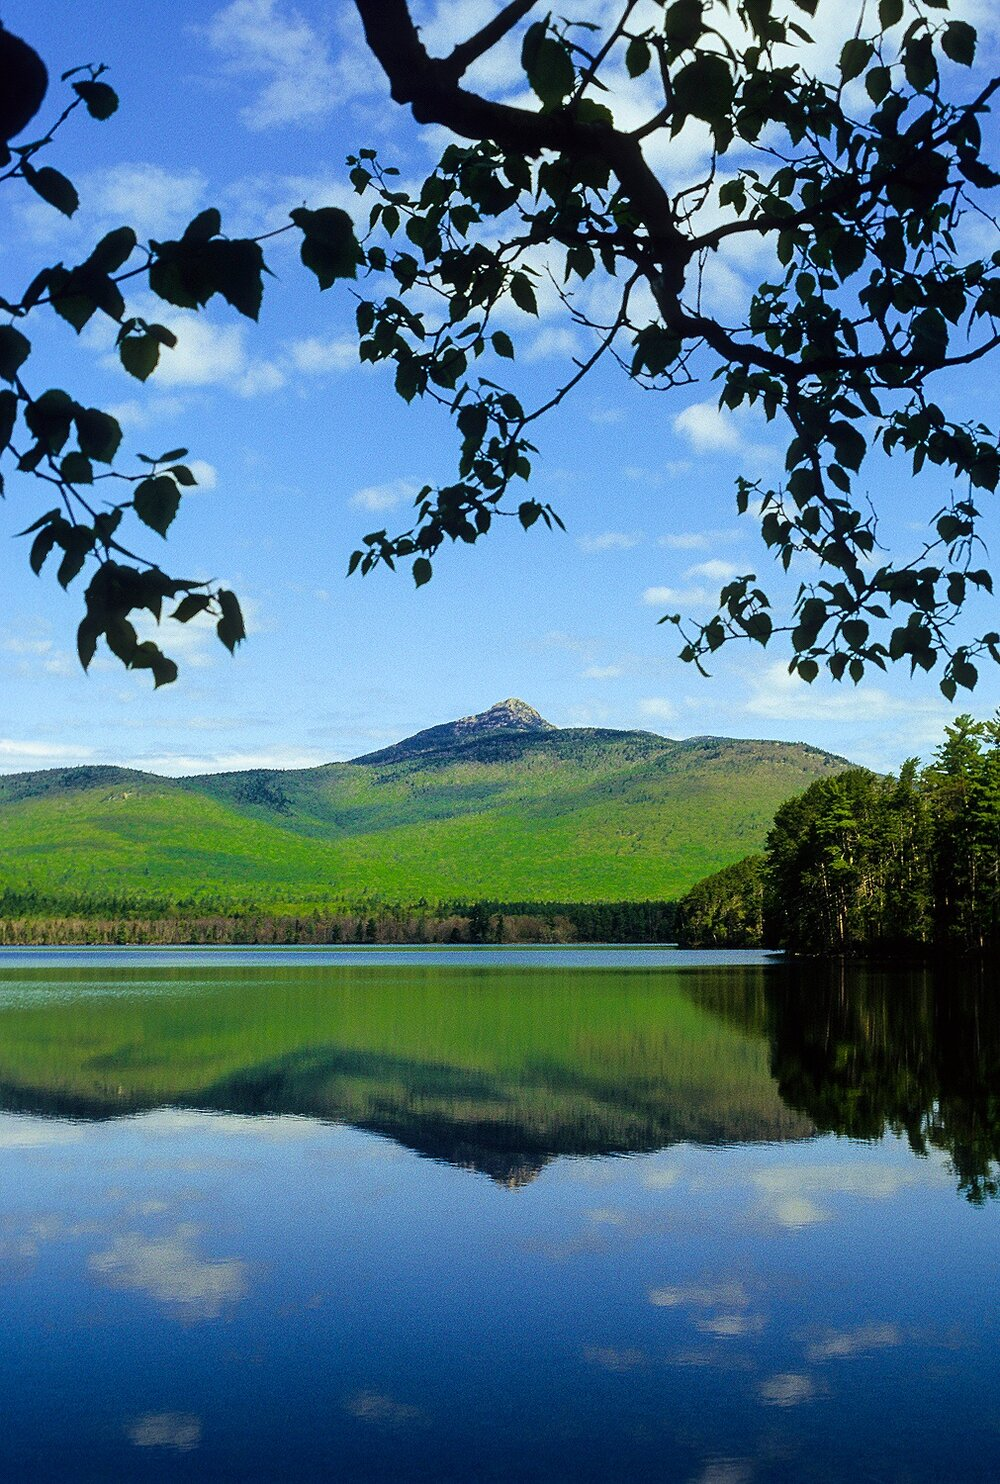 Chocorua Summer Day - White Mountain National Forest, New Hampshire